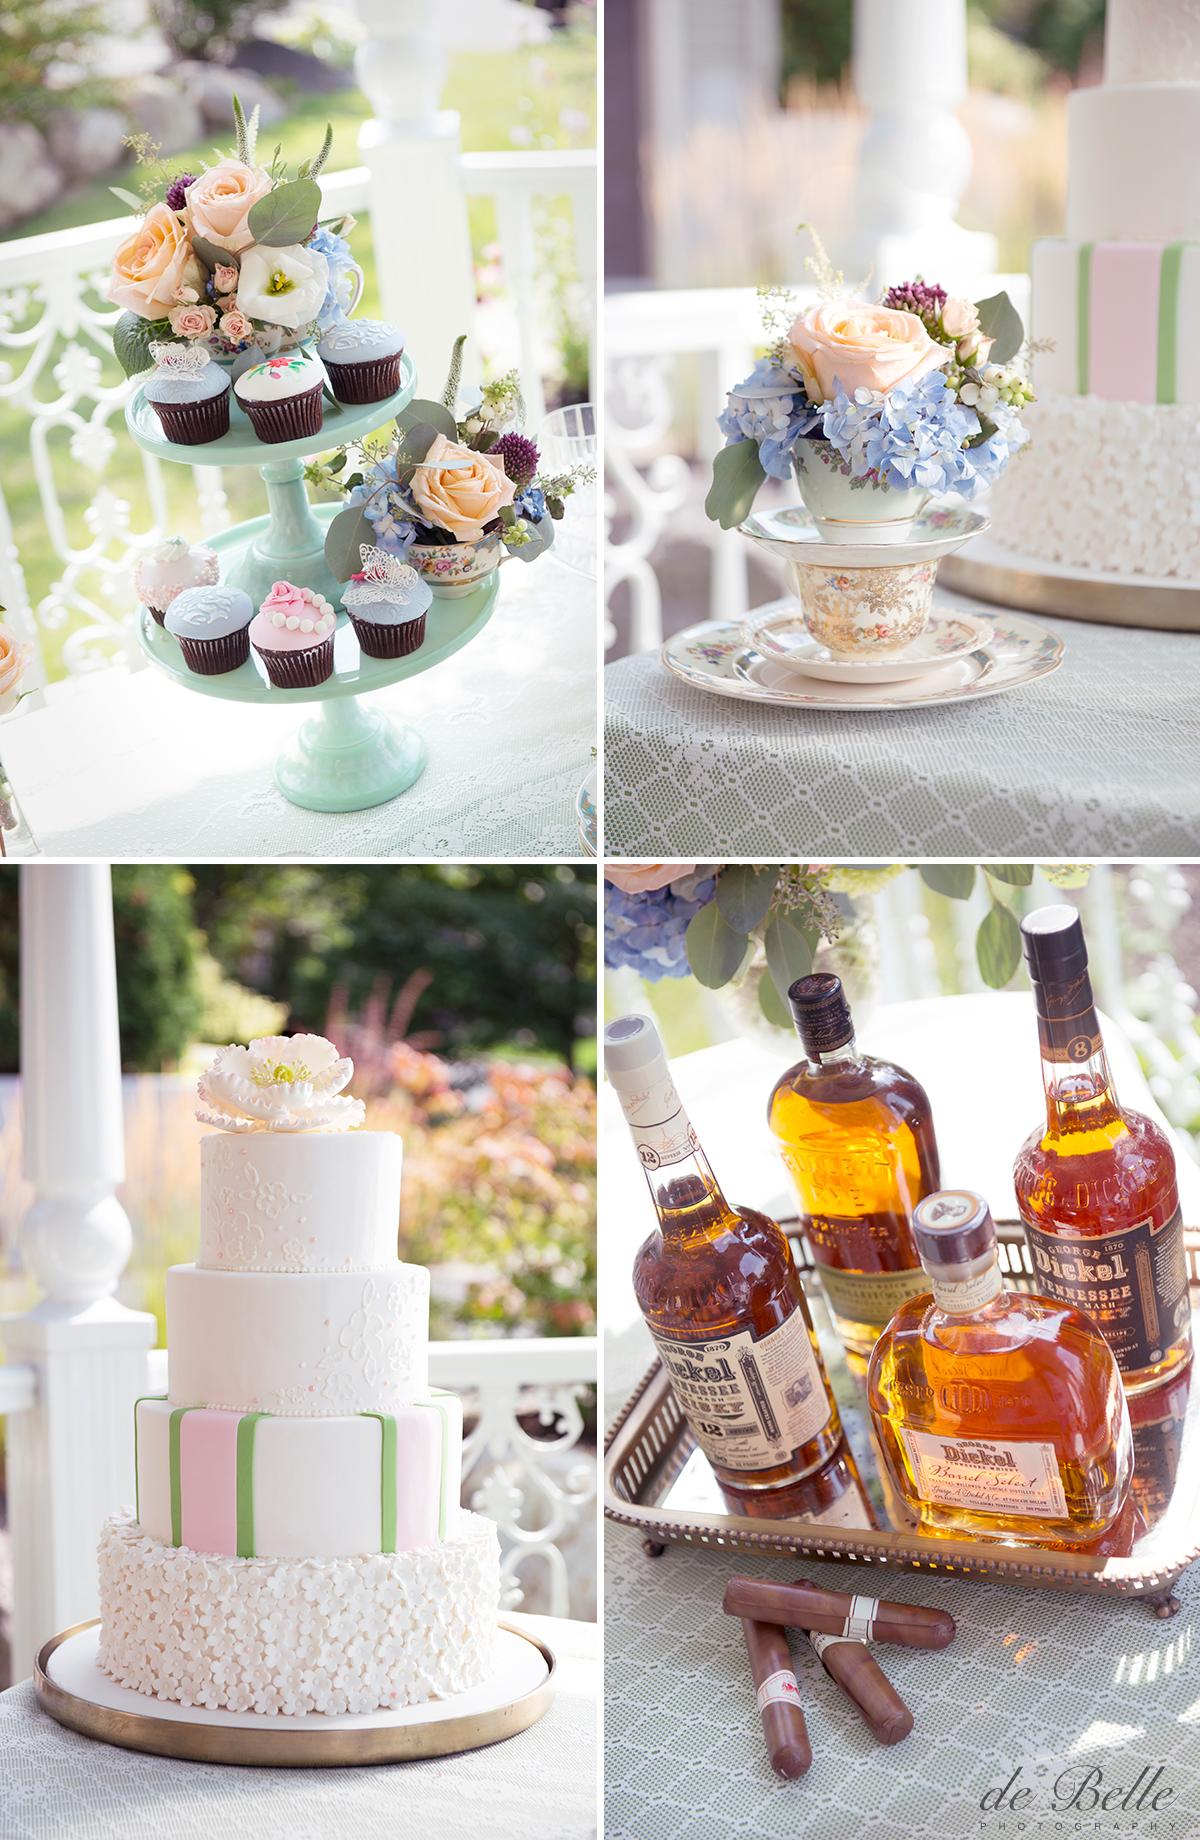 Montreal-Wedding-Photographer-Debelle-EW4